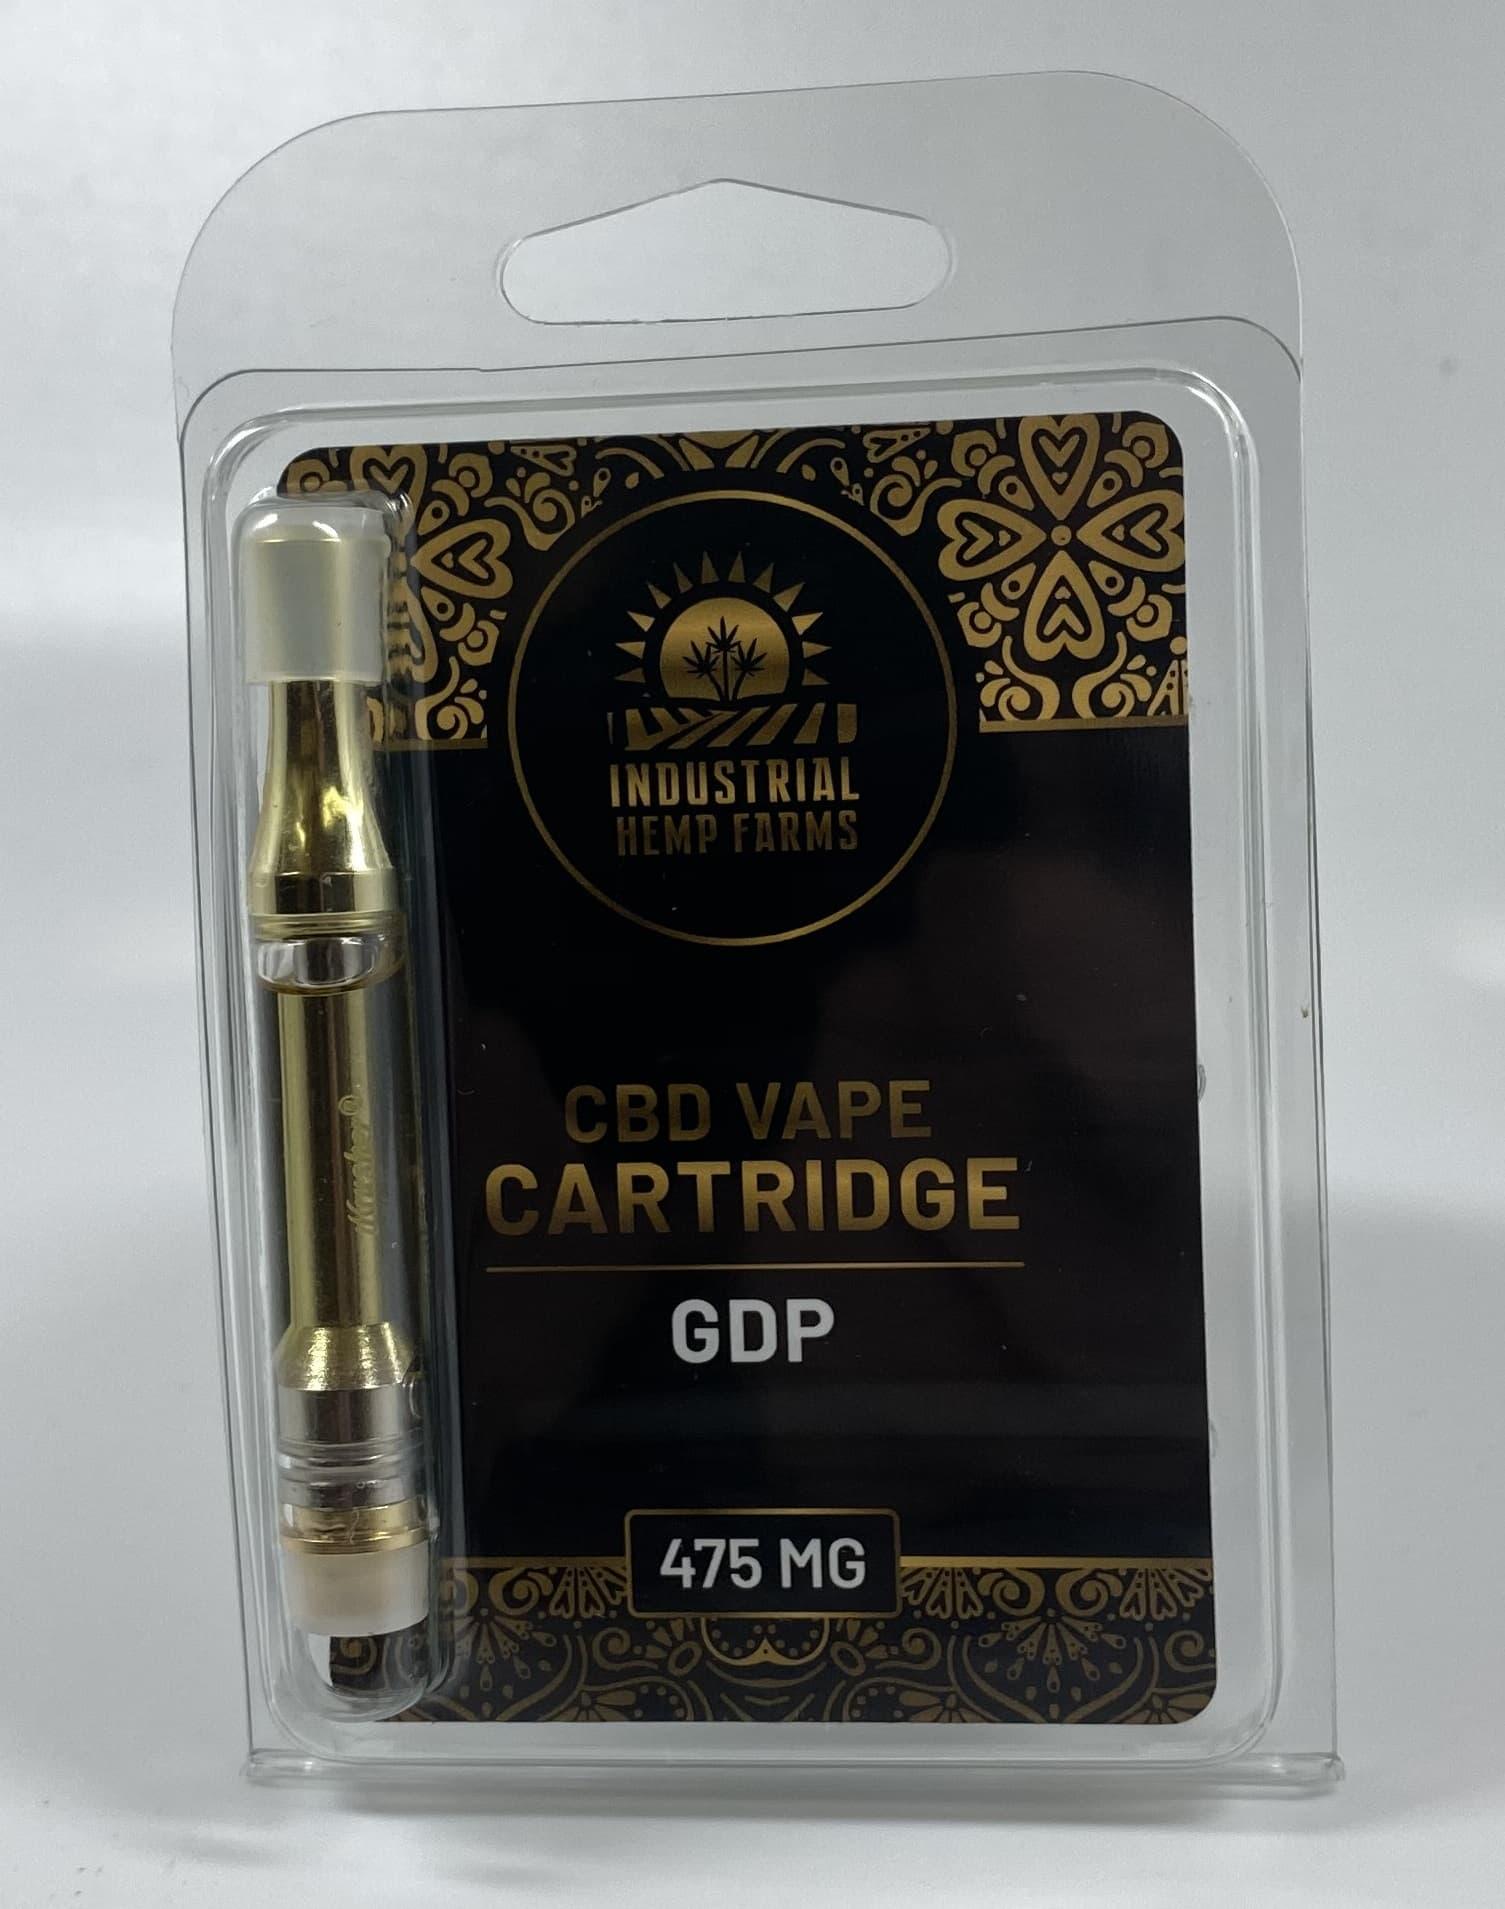 grandaddy purple cbd vape pen cartridge for sale